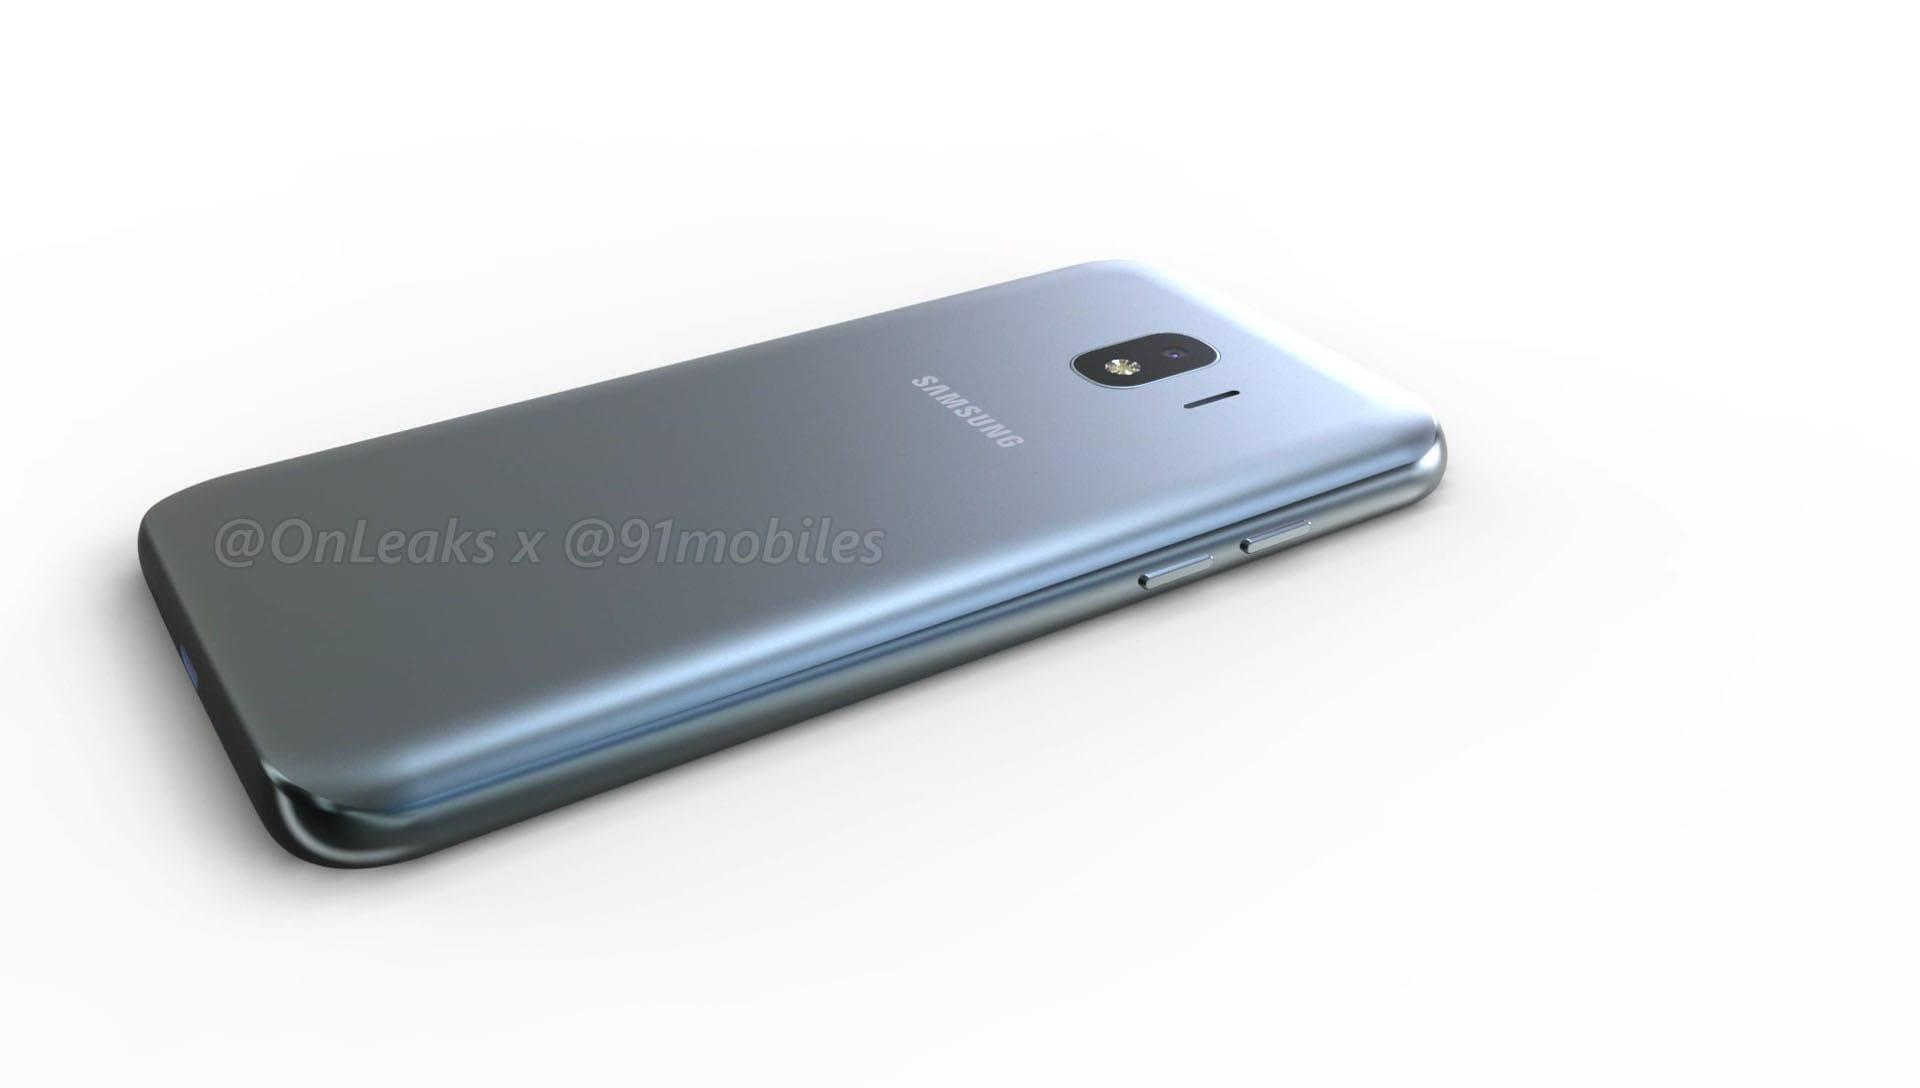 Размещены рендеры телефона Самсунг Galaxy J2 Pro (2018)